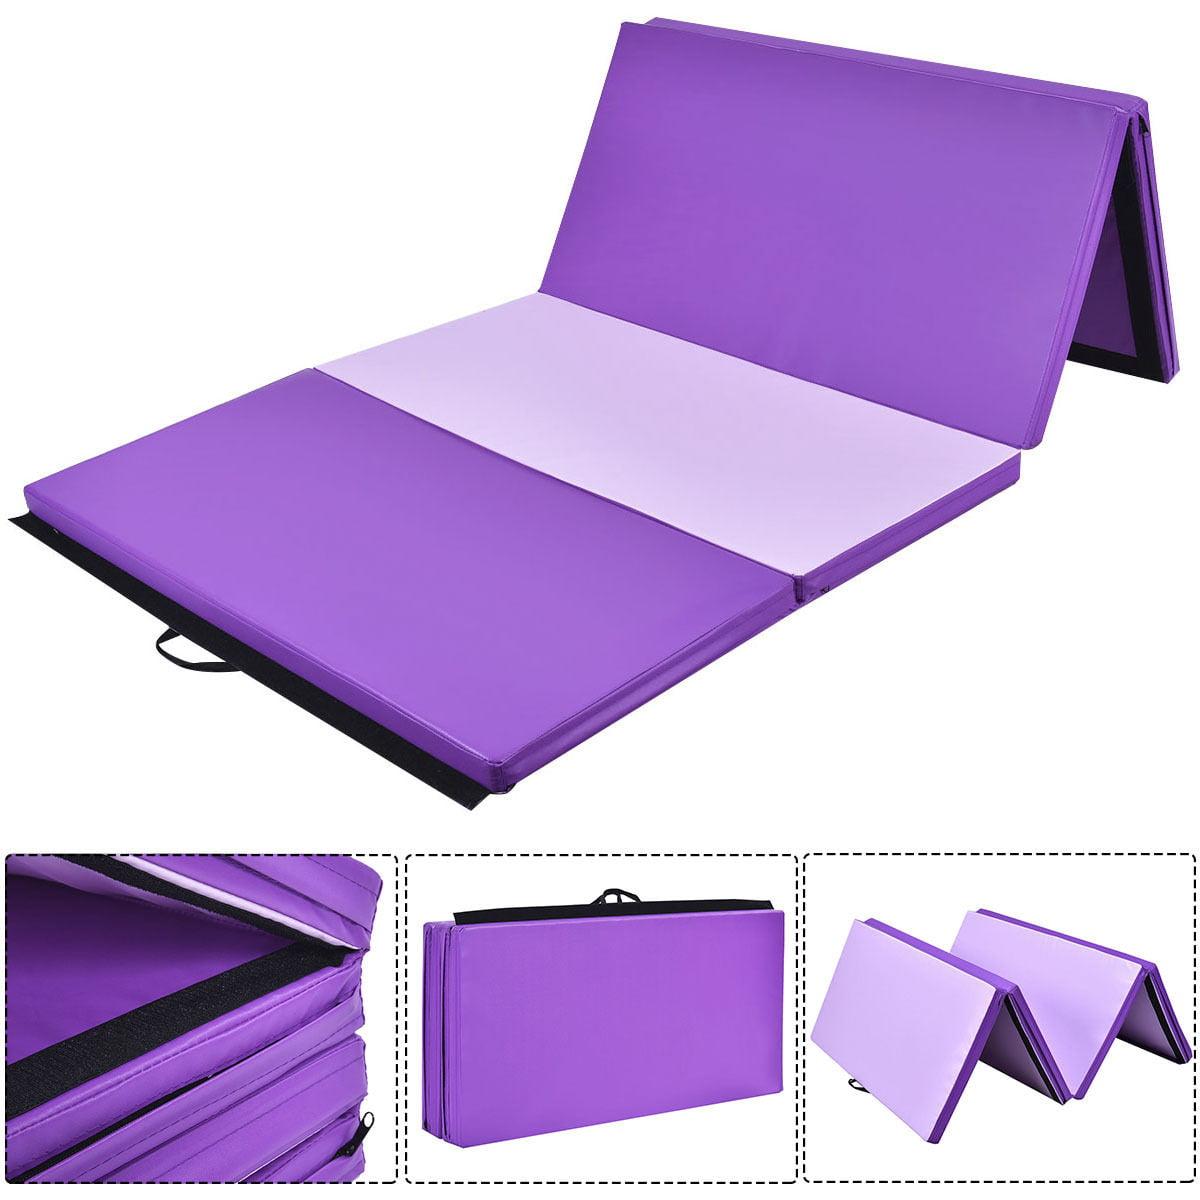 costway gymnastics mat thick folding panel gym fitness exercise mat purplepink walmartcom - Gymnastics Mats For Home